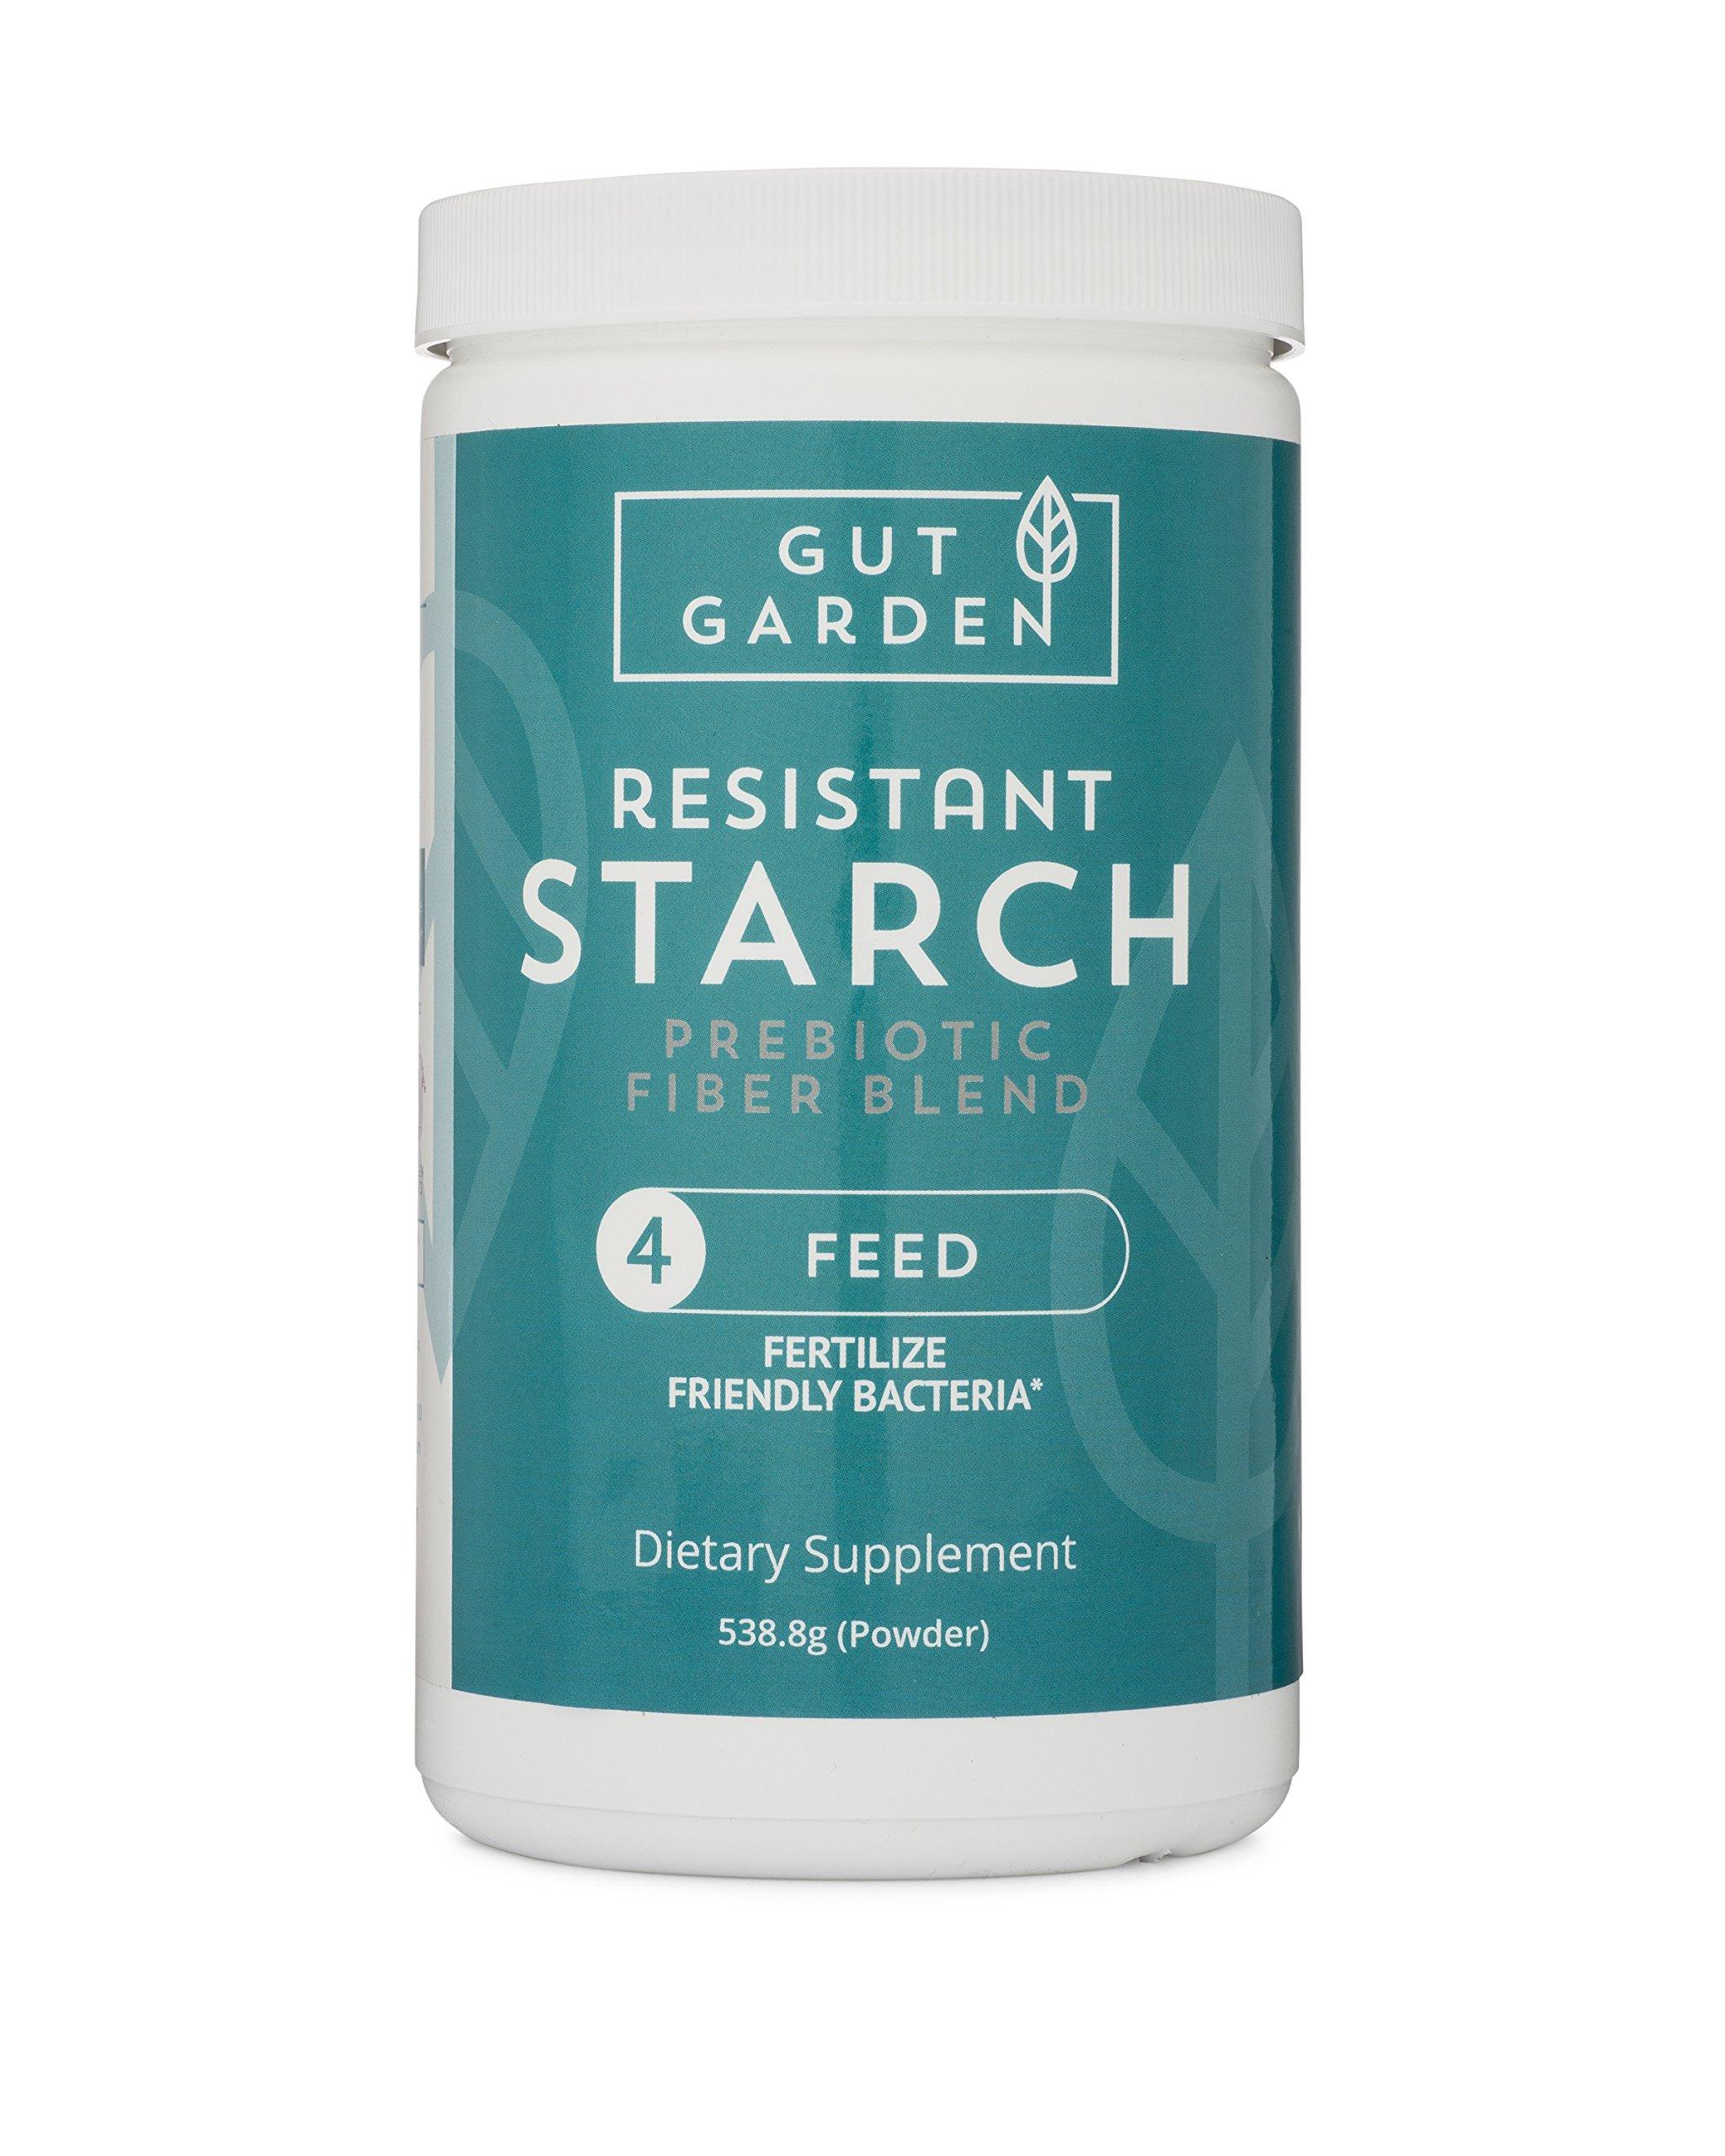 Gut Garden Resistant Starch Prebiotic Fiber Blend